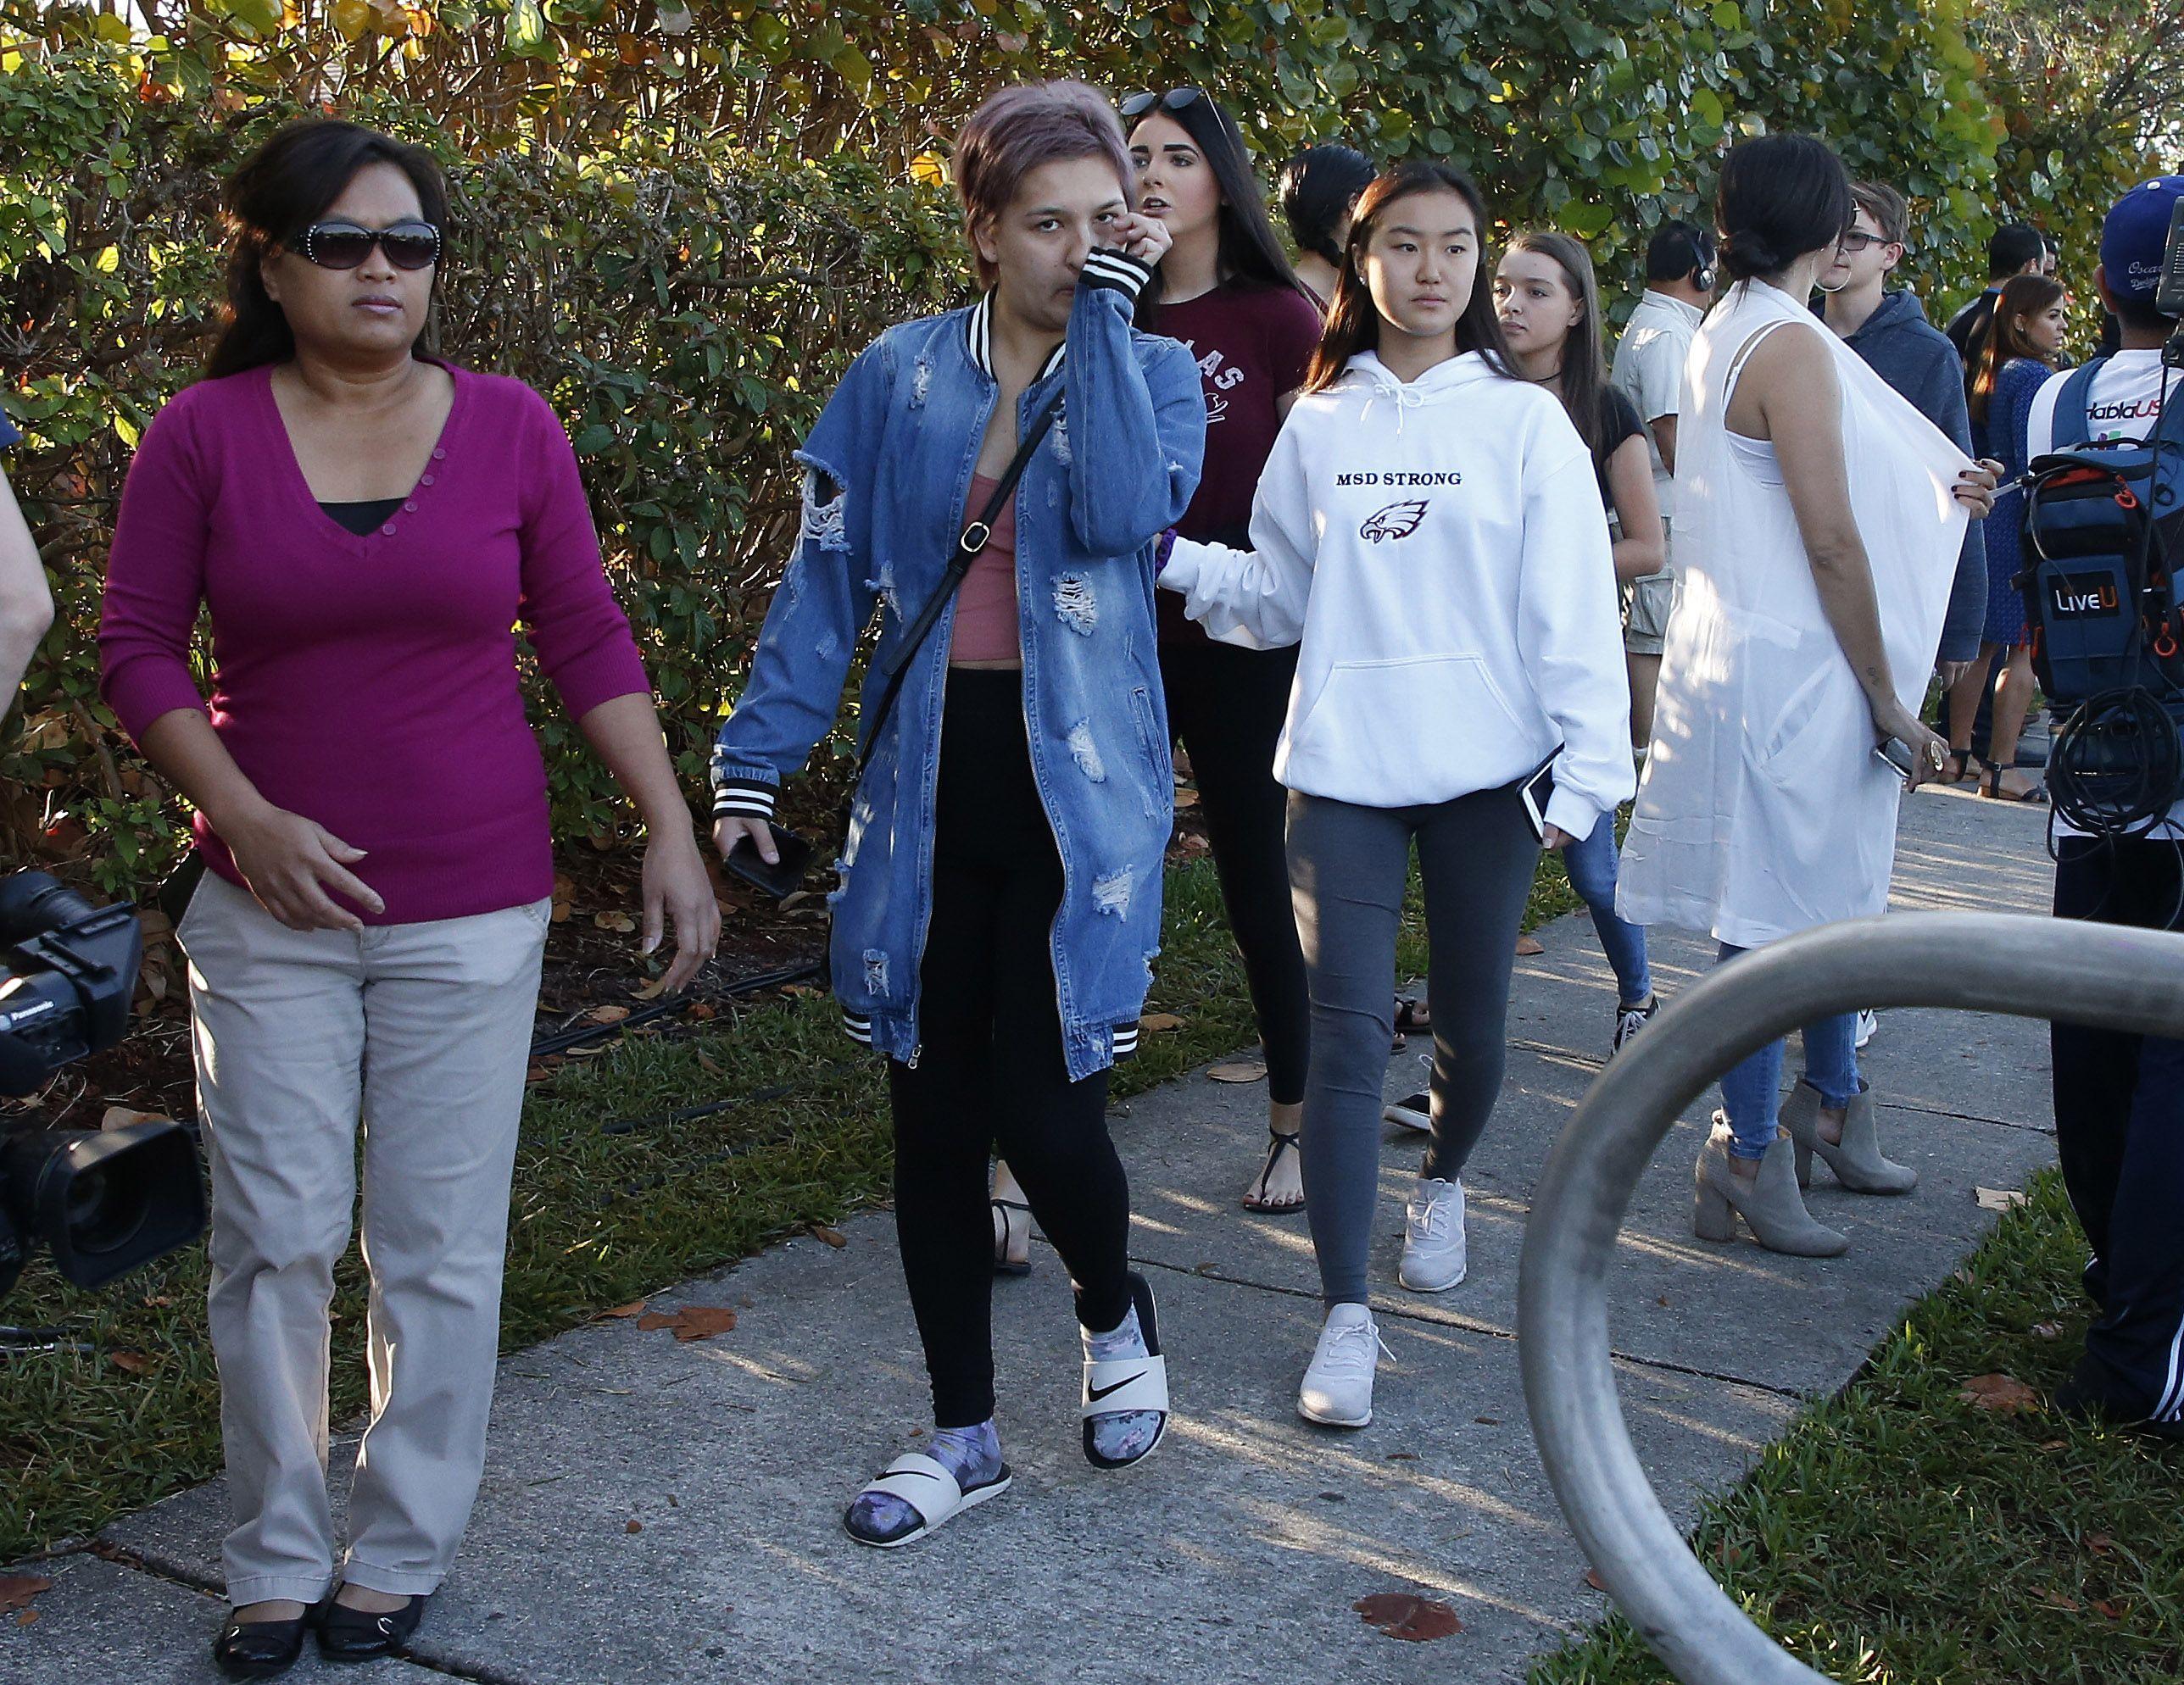 Student walks